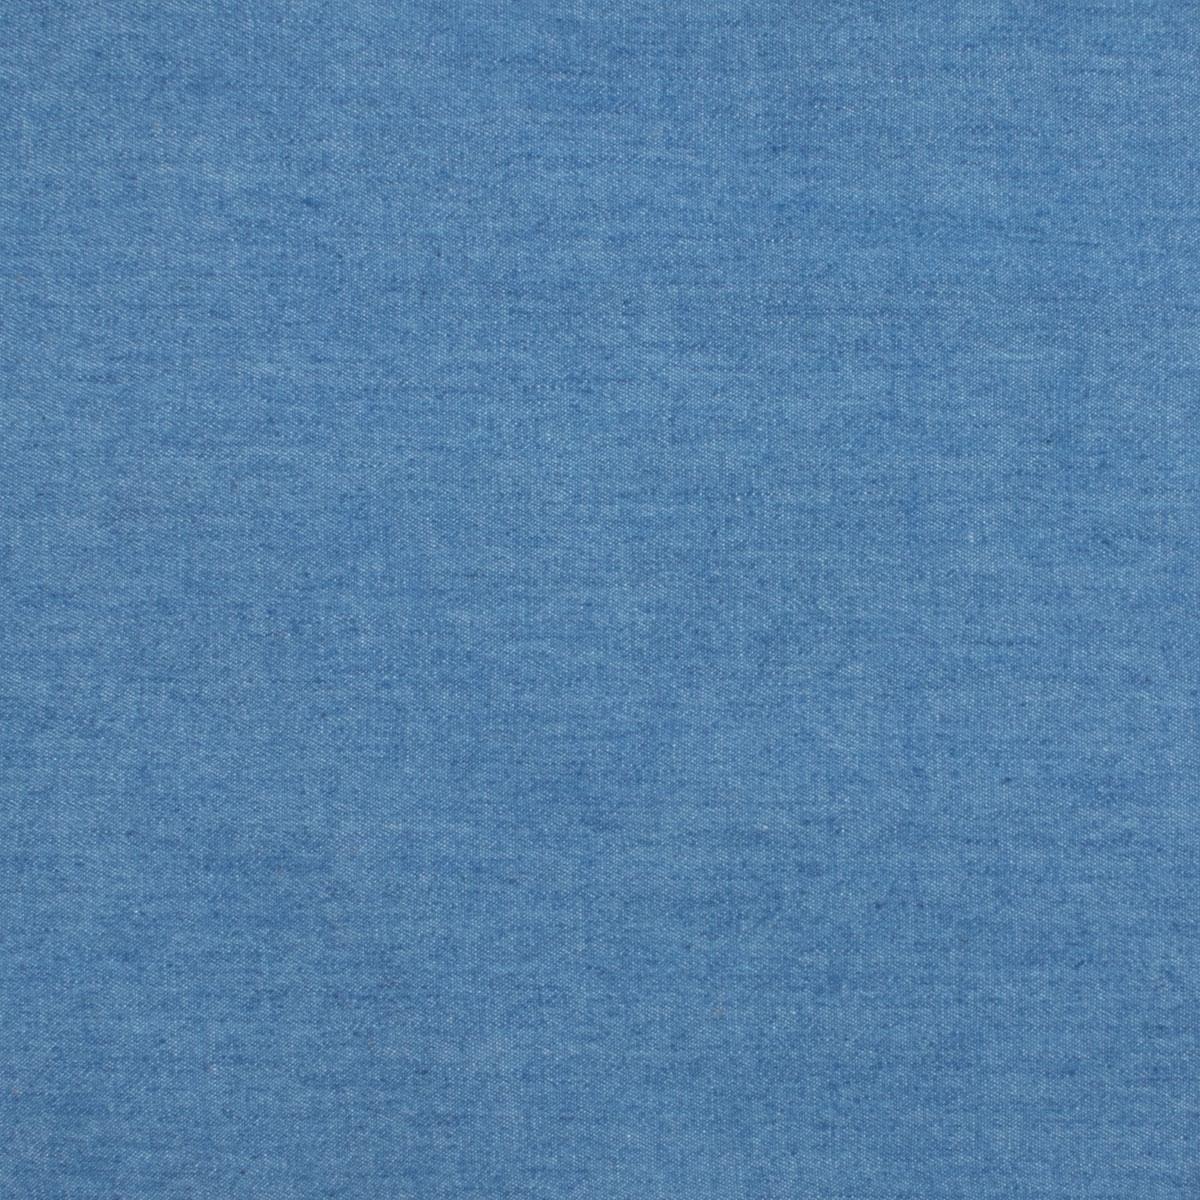 Denim Fabric. Light Blue. | Sew Essential